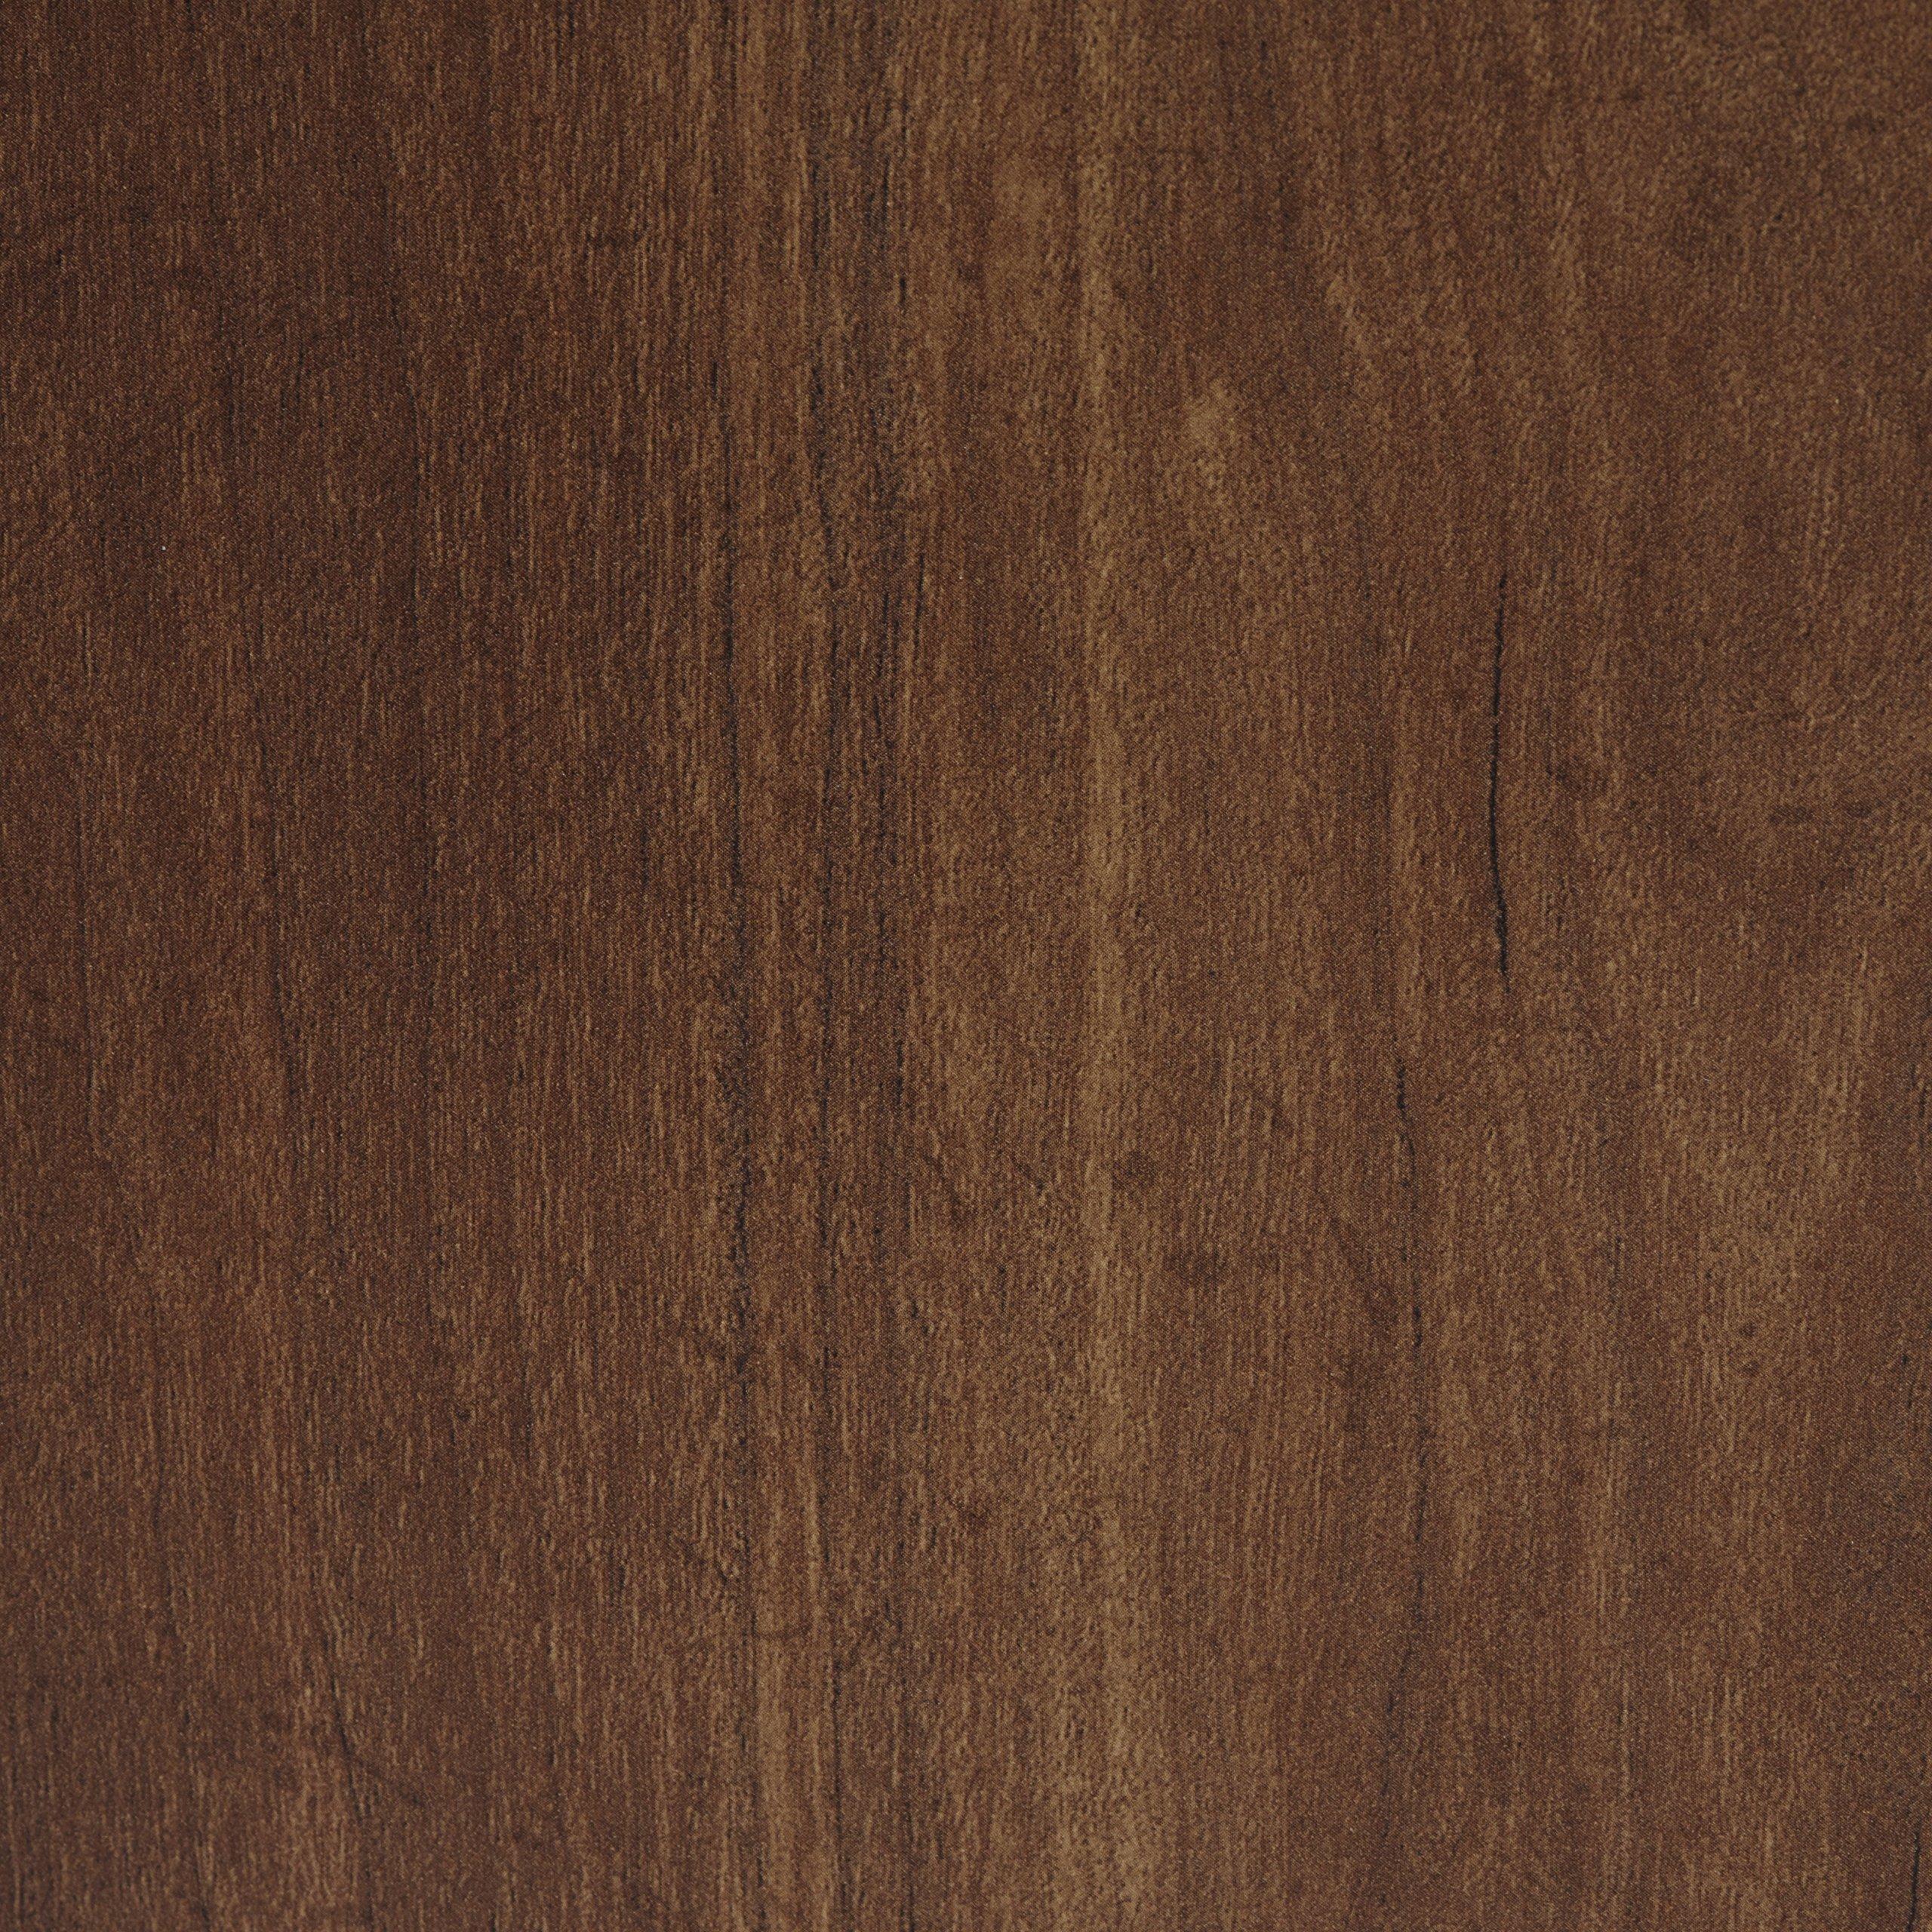 IRIS 3-Tier Basic Wood Bookcase Storage Shelf, Dark Brown by IRIS USA, Inc. (Image #7)